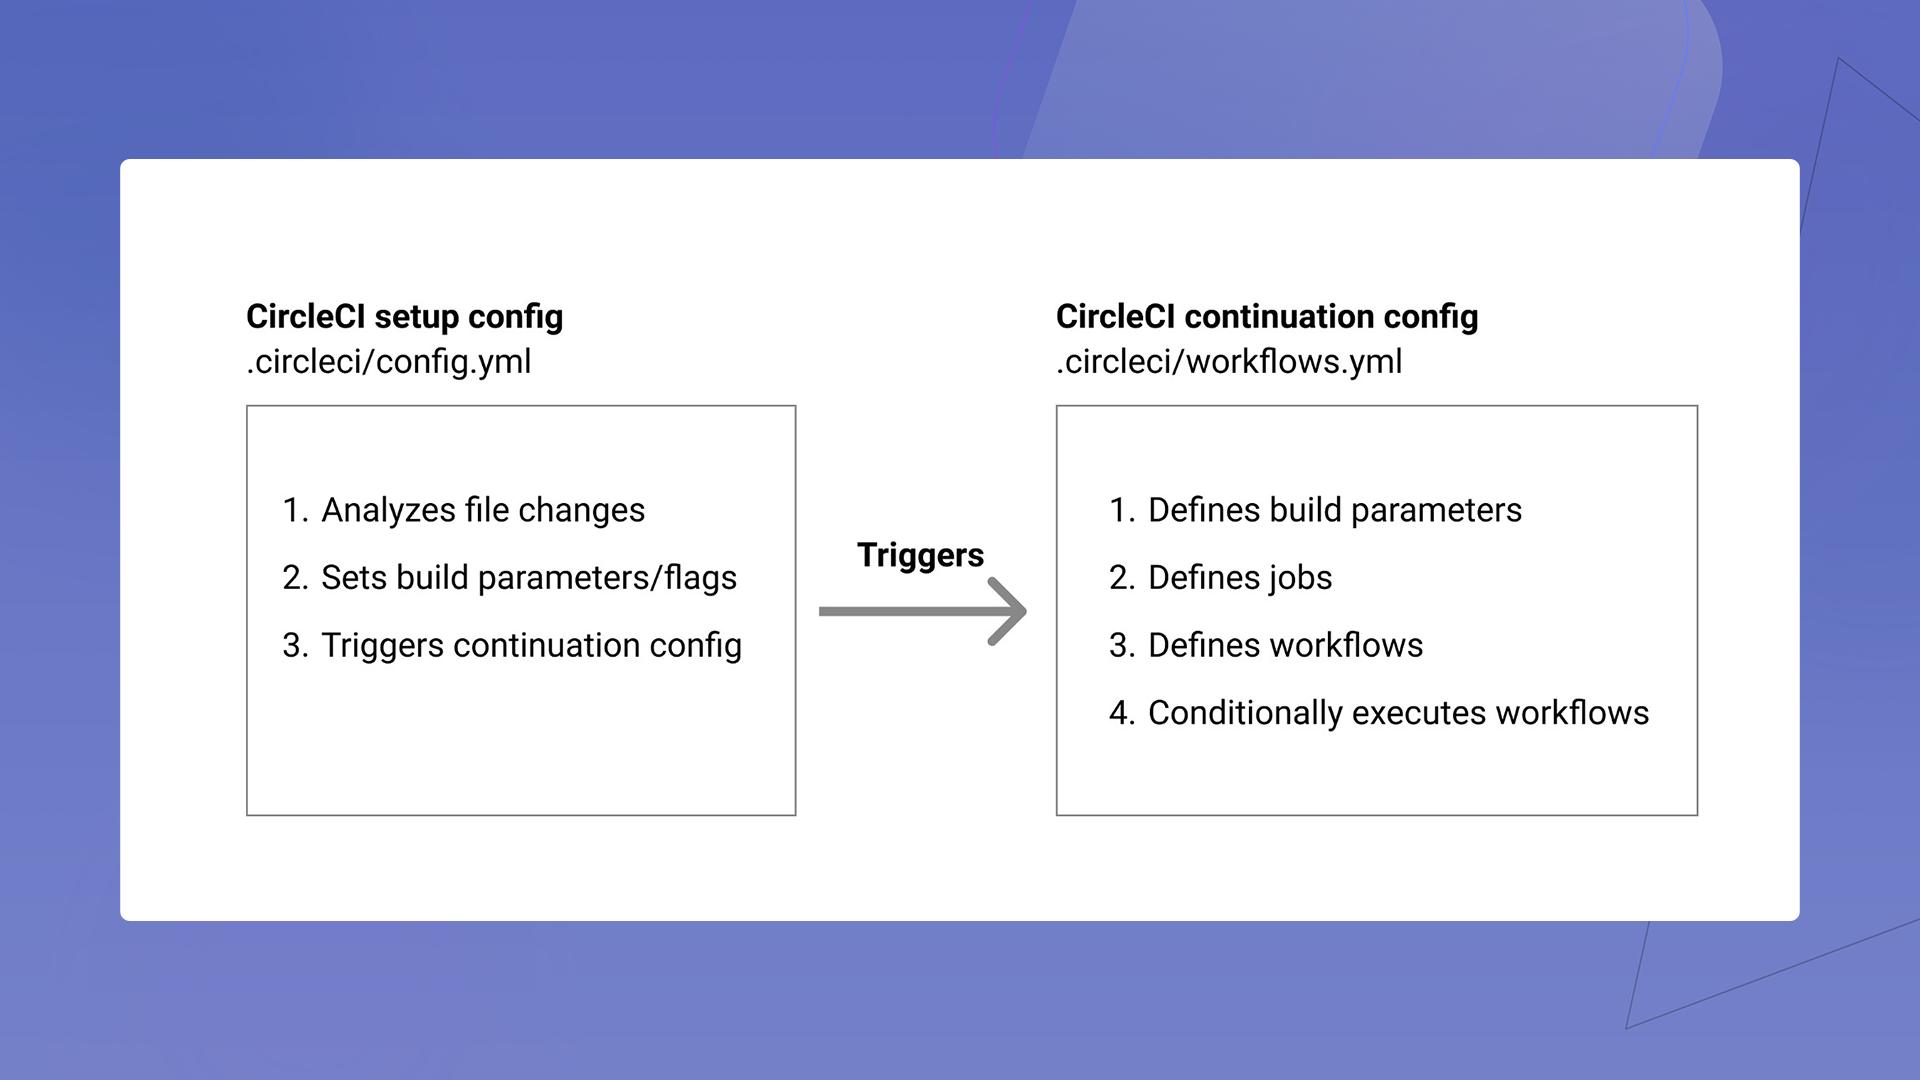 CircleCI setup configuration triggers